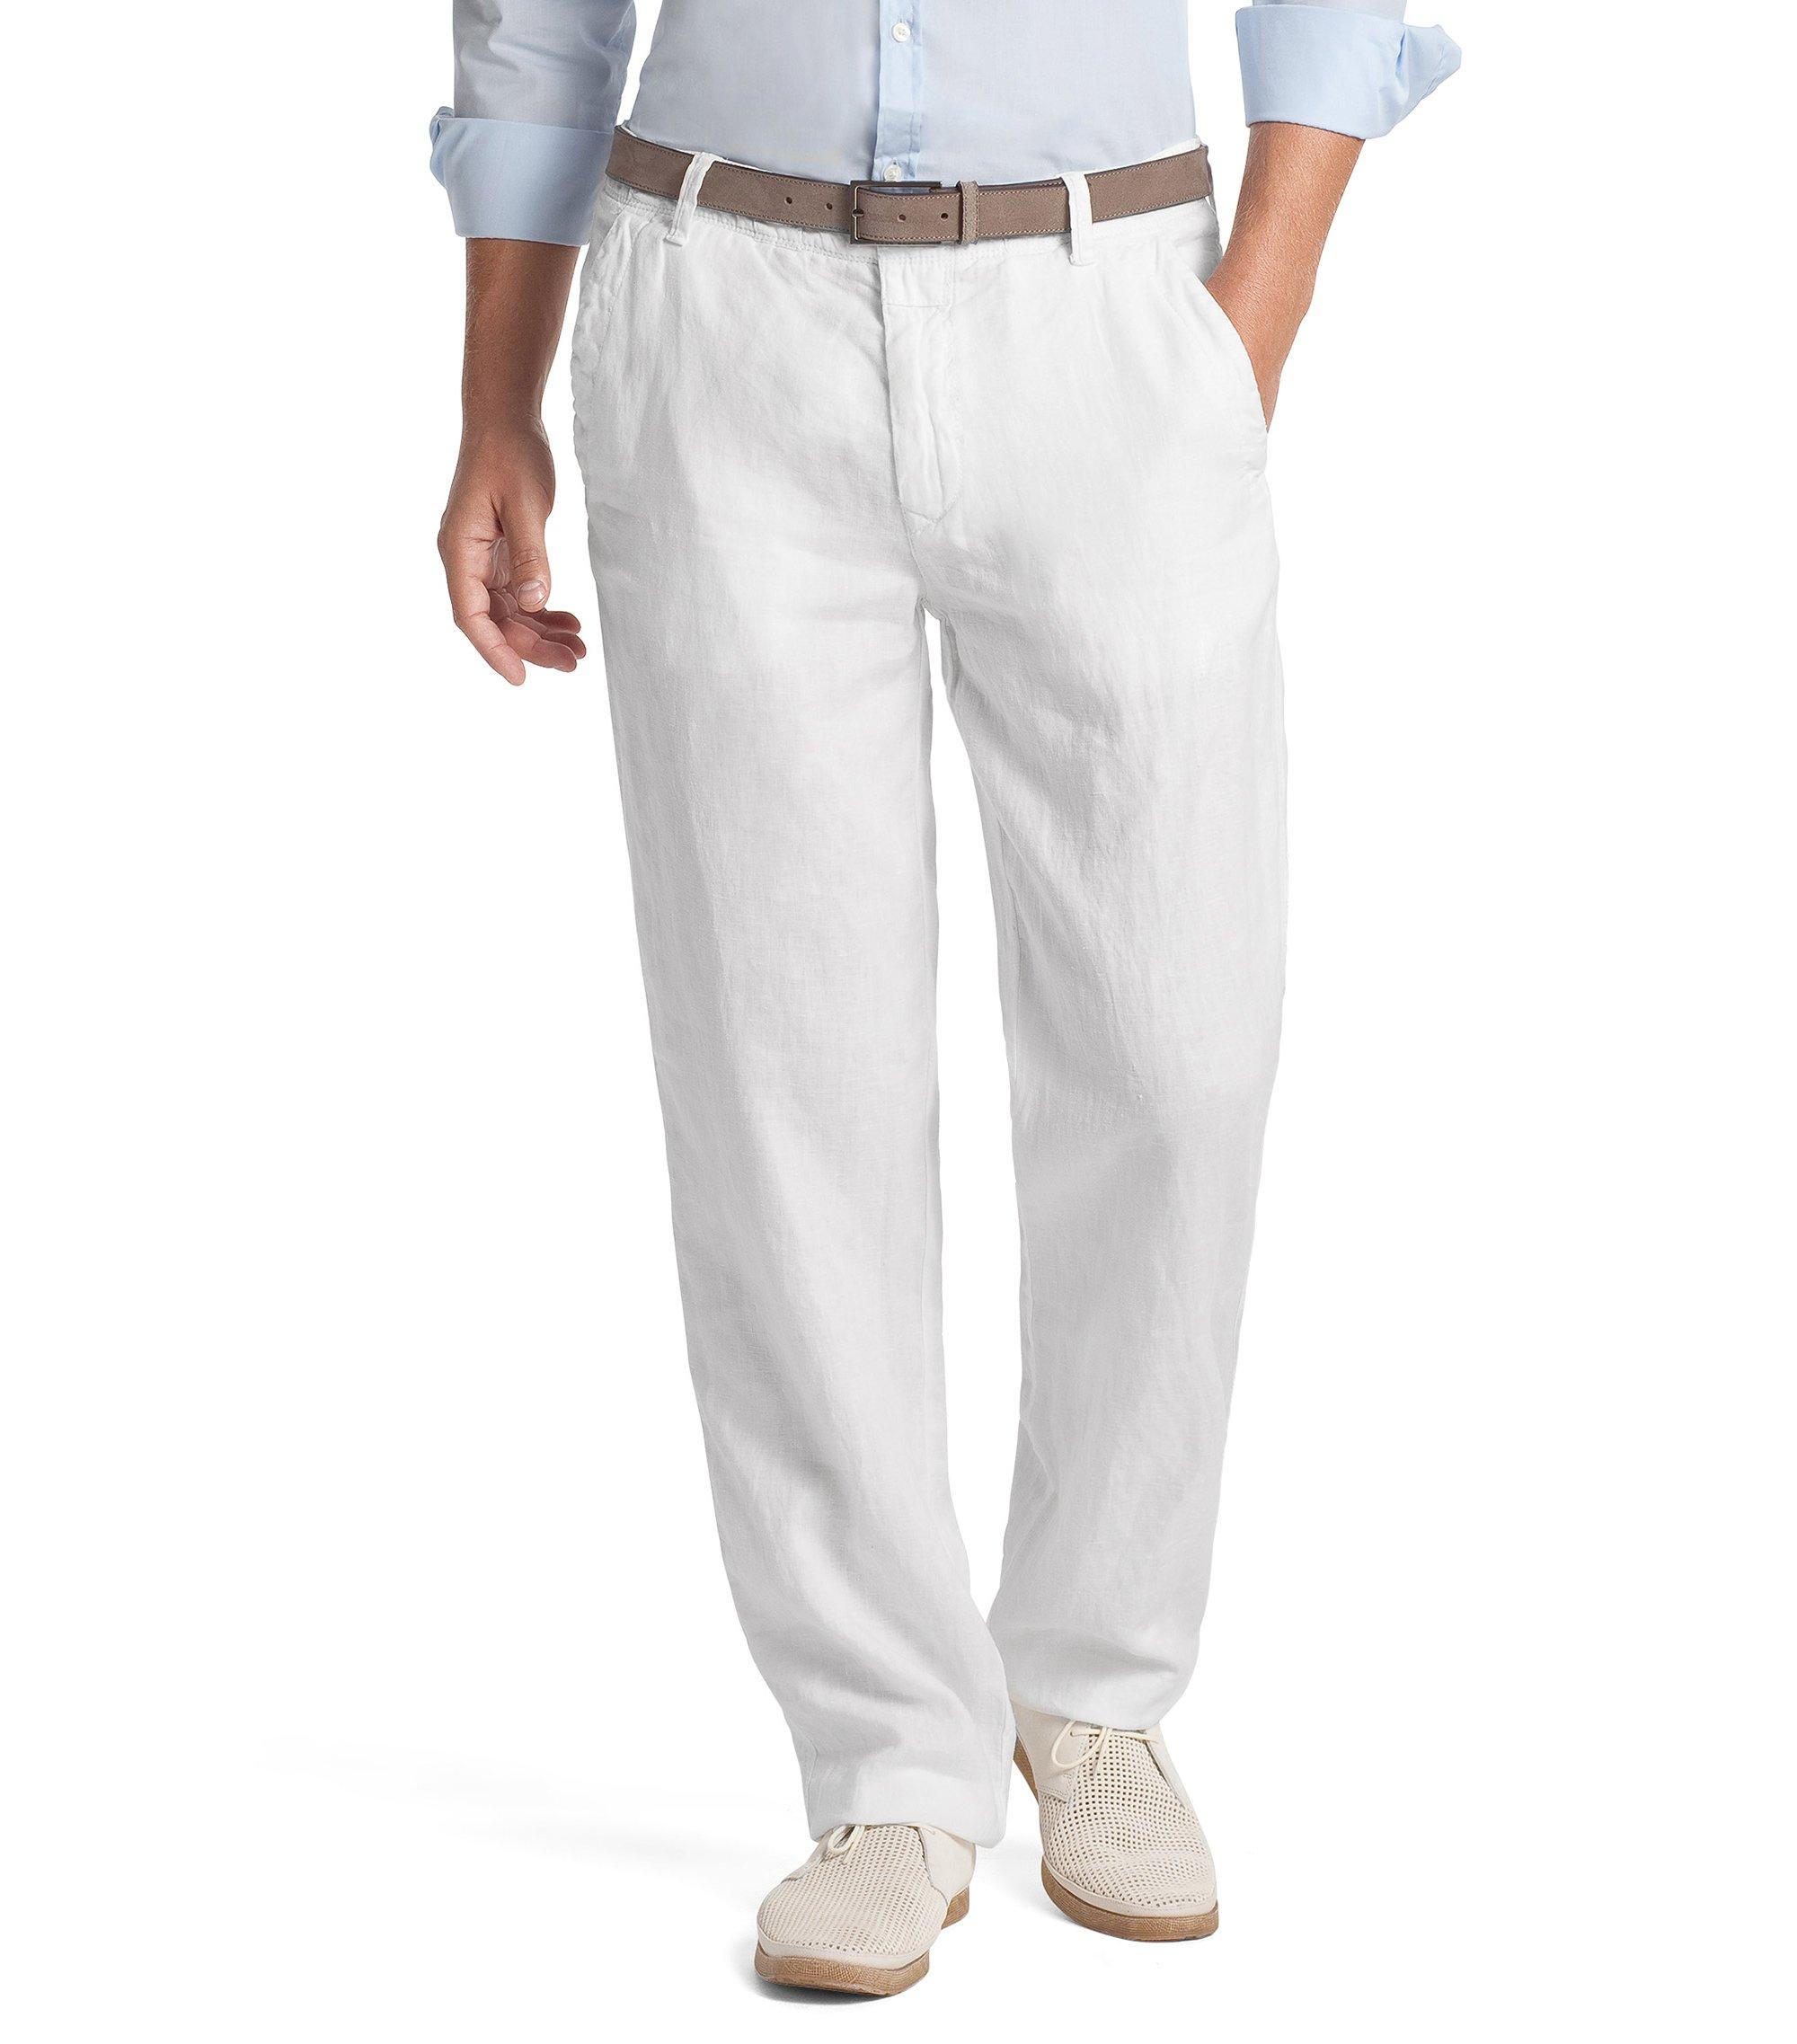 Comfort-Fit Leinenhose ´Callum-W`, Weiß